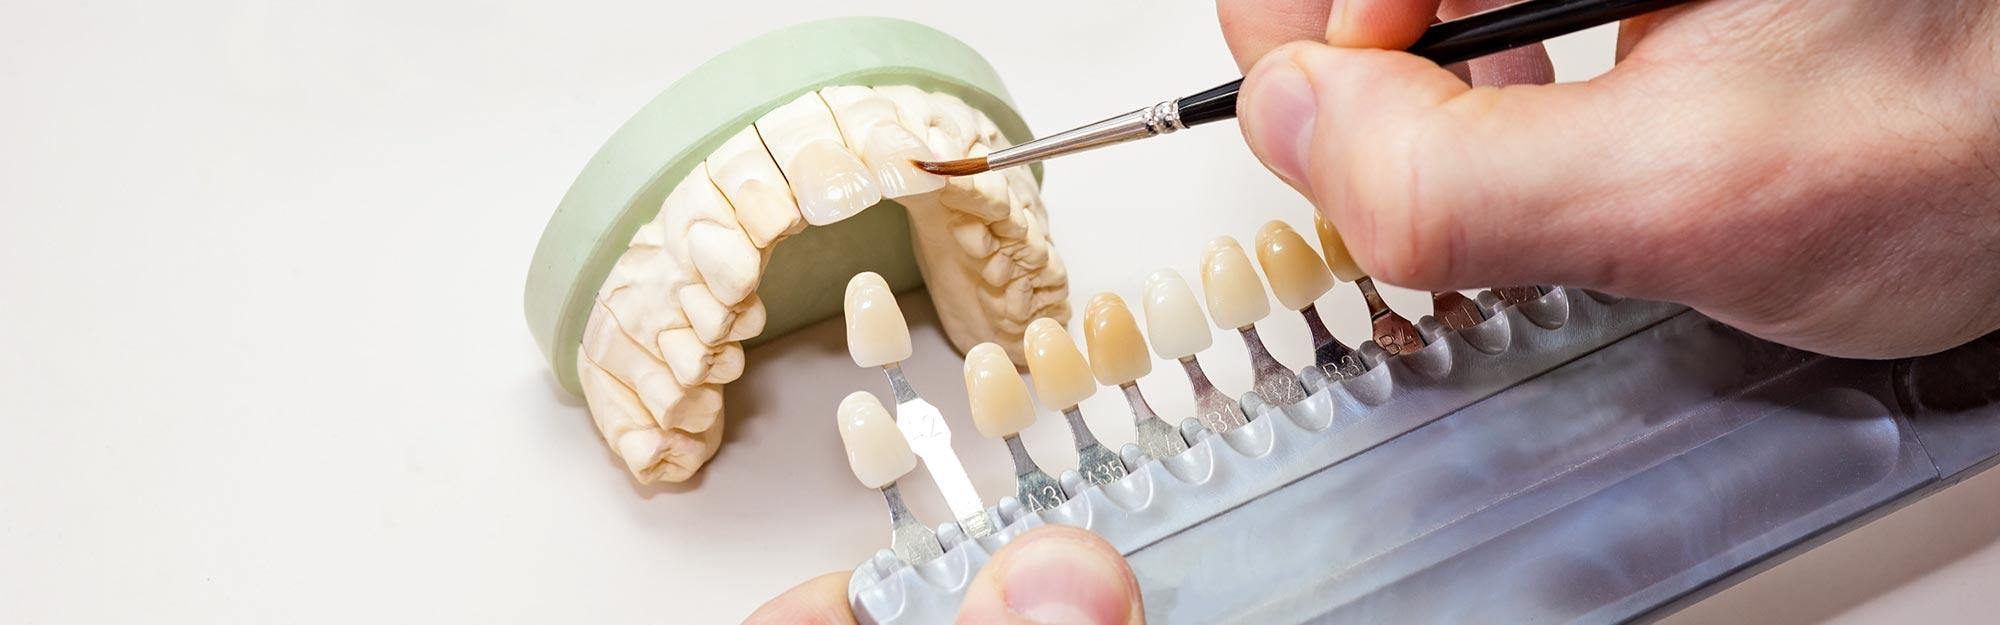 Zahntechniker passt Zahnersatz beim Zahnarzt in Bautzen individuell an.